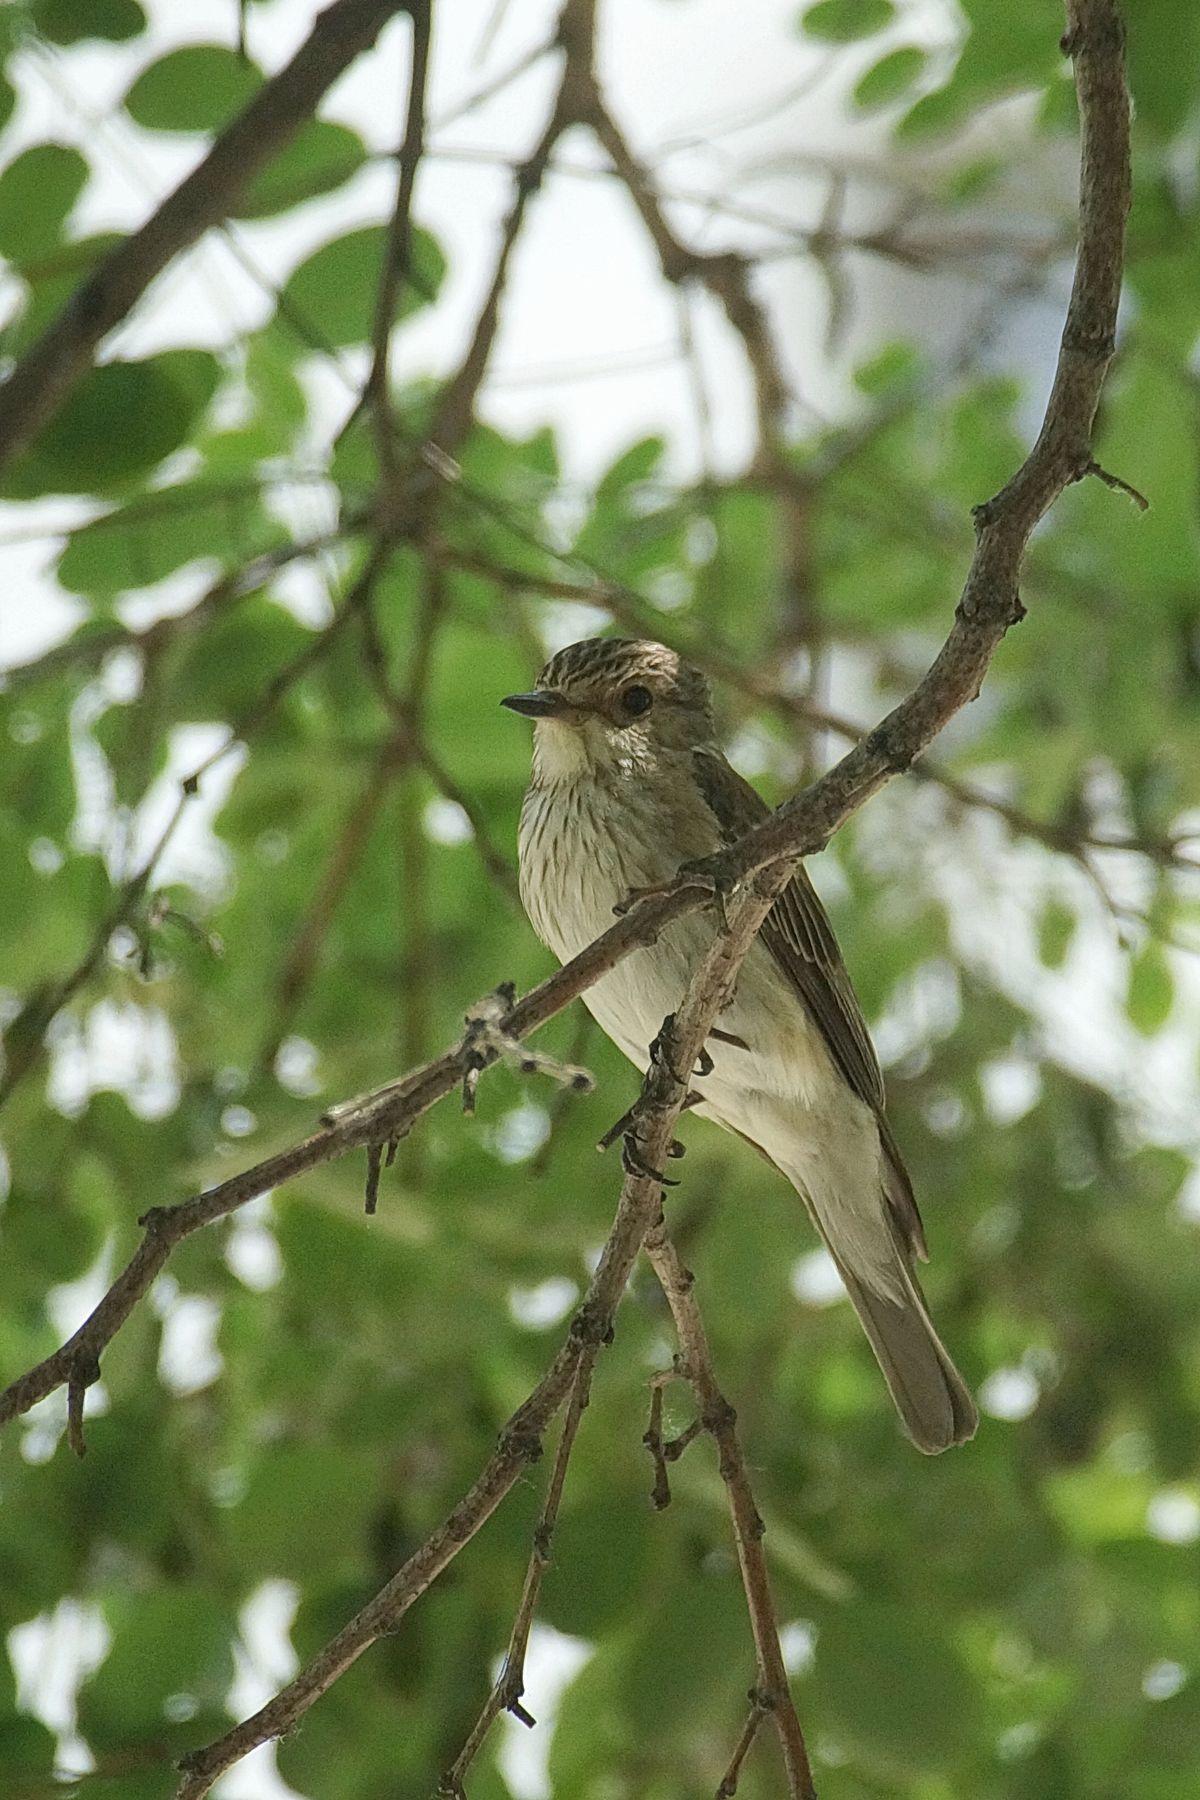 Серая мухоловка Волгоград серая мухоловка лето птицы